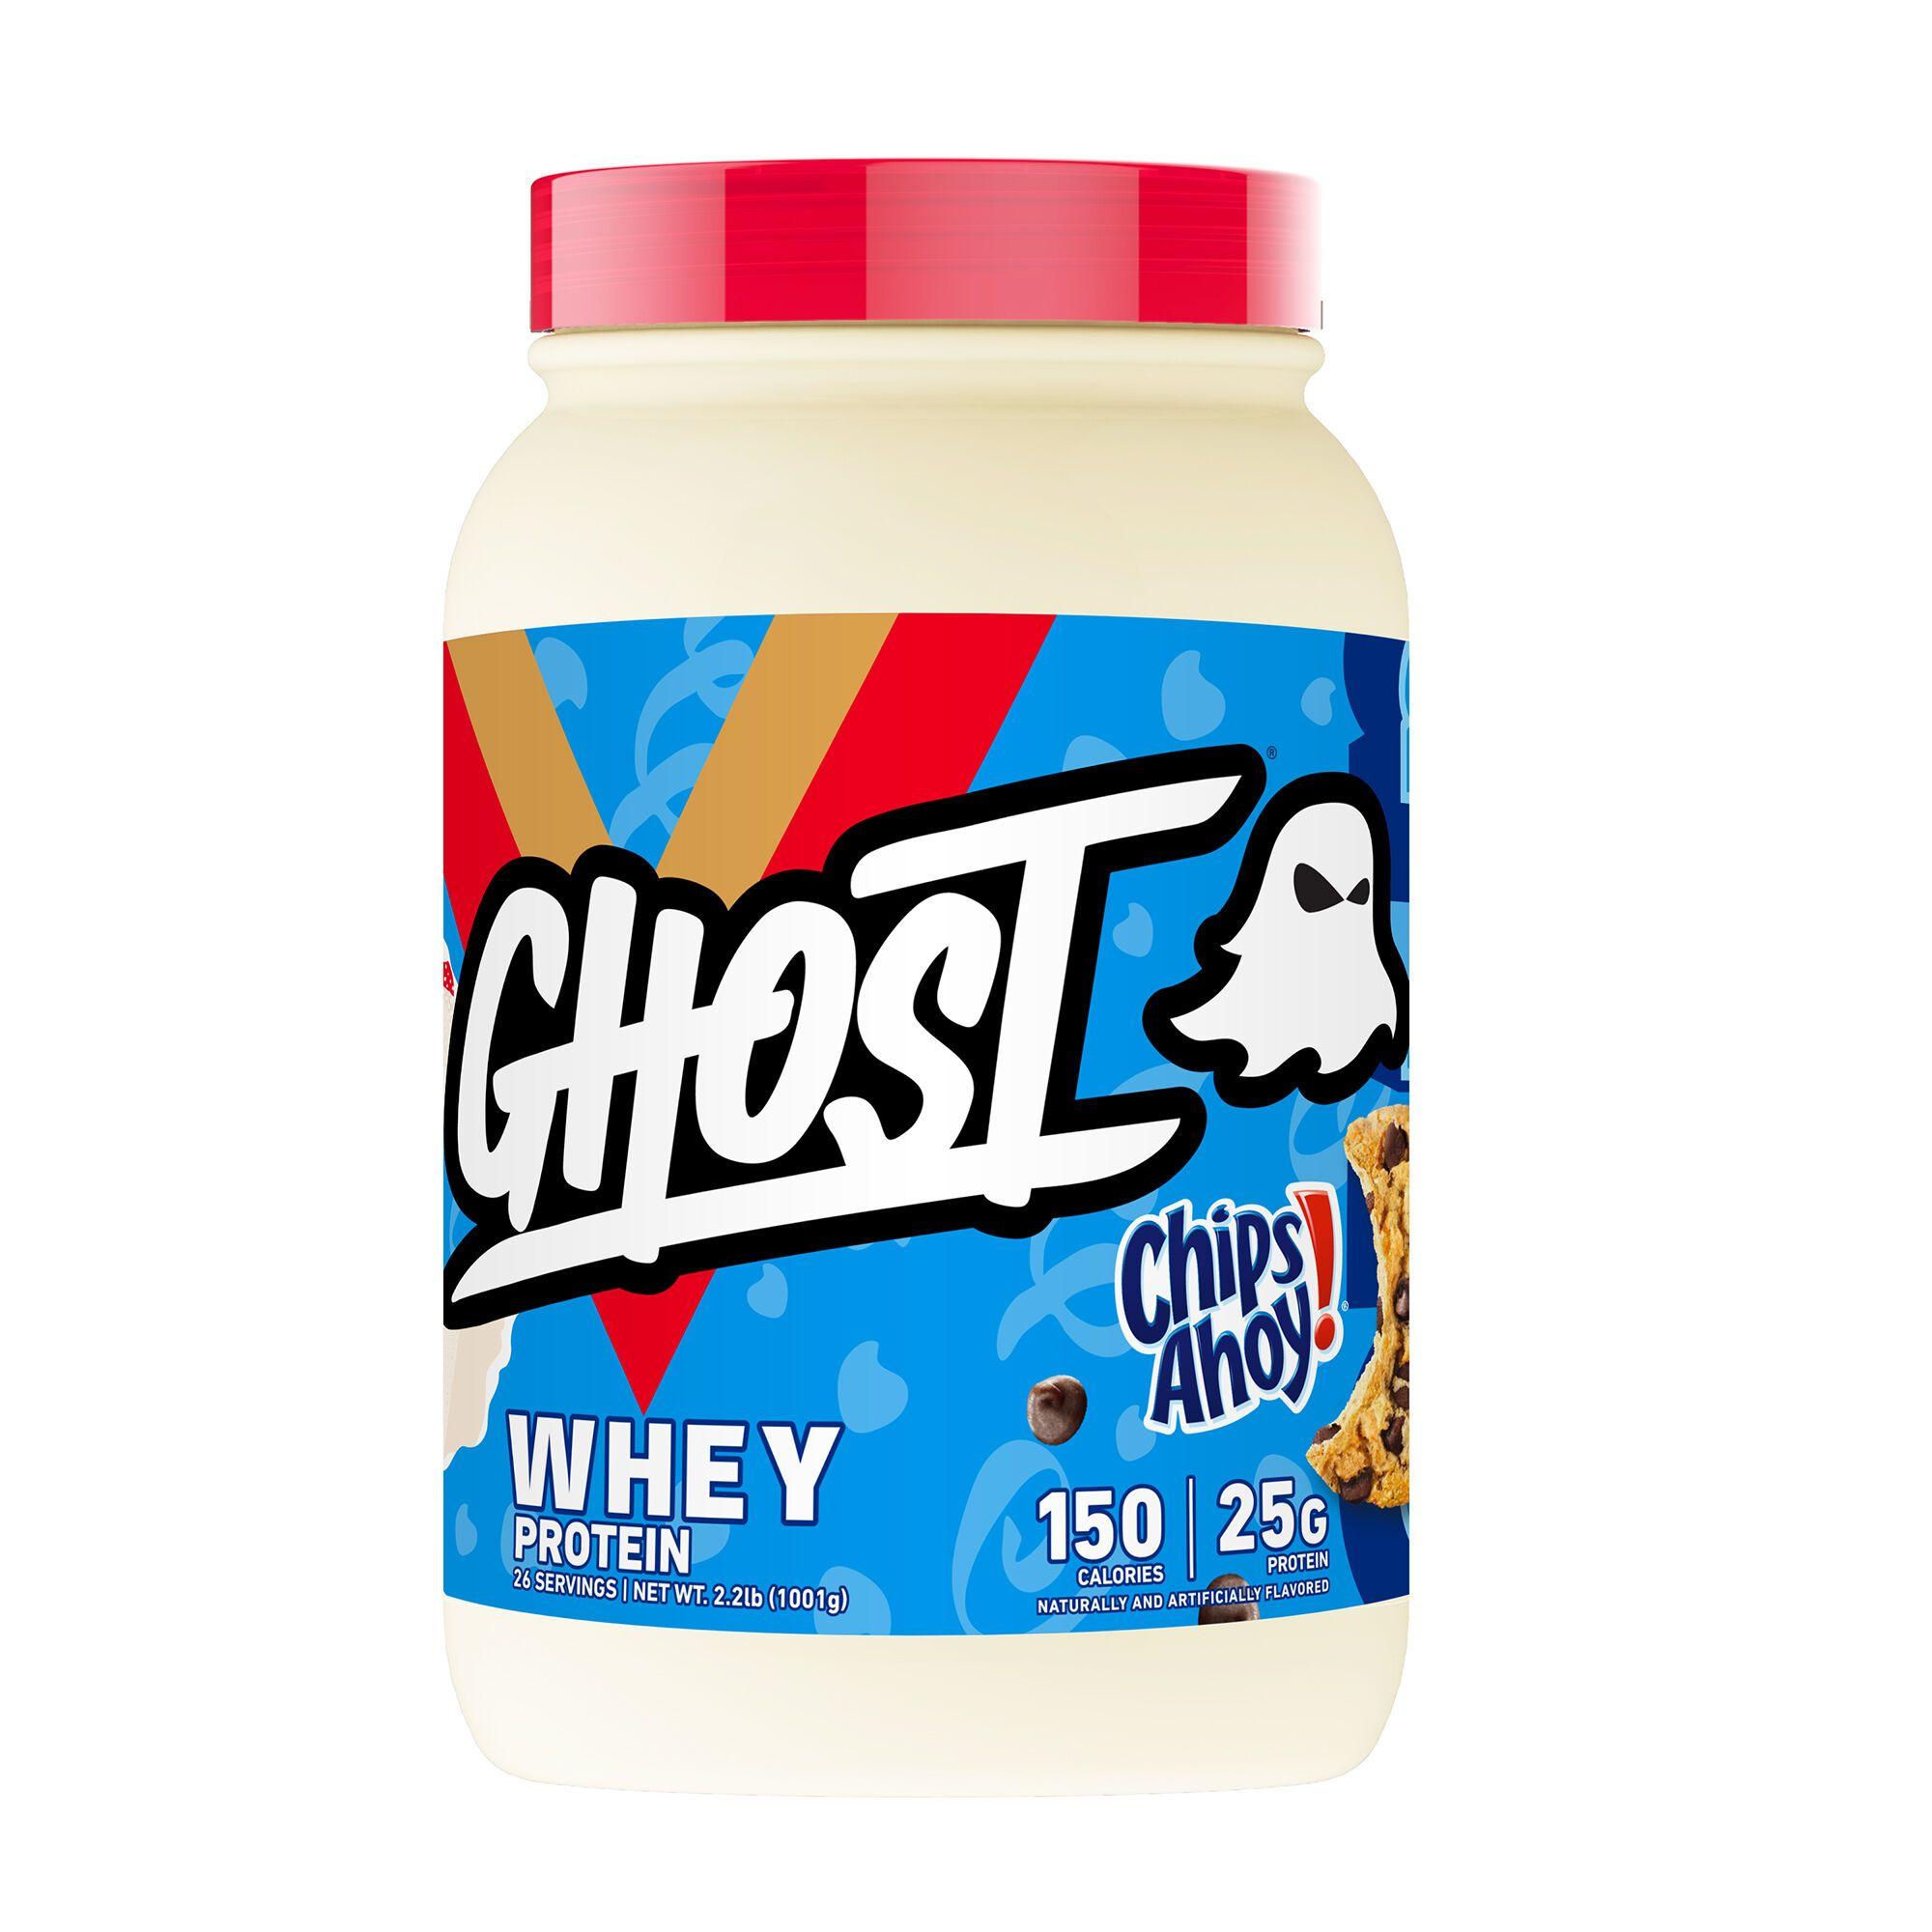 Whey Protein Powder, Protein